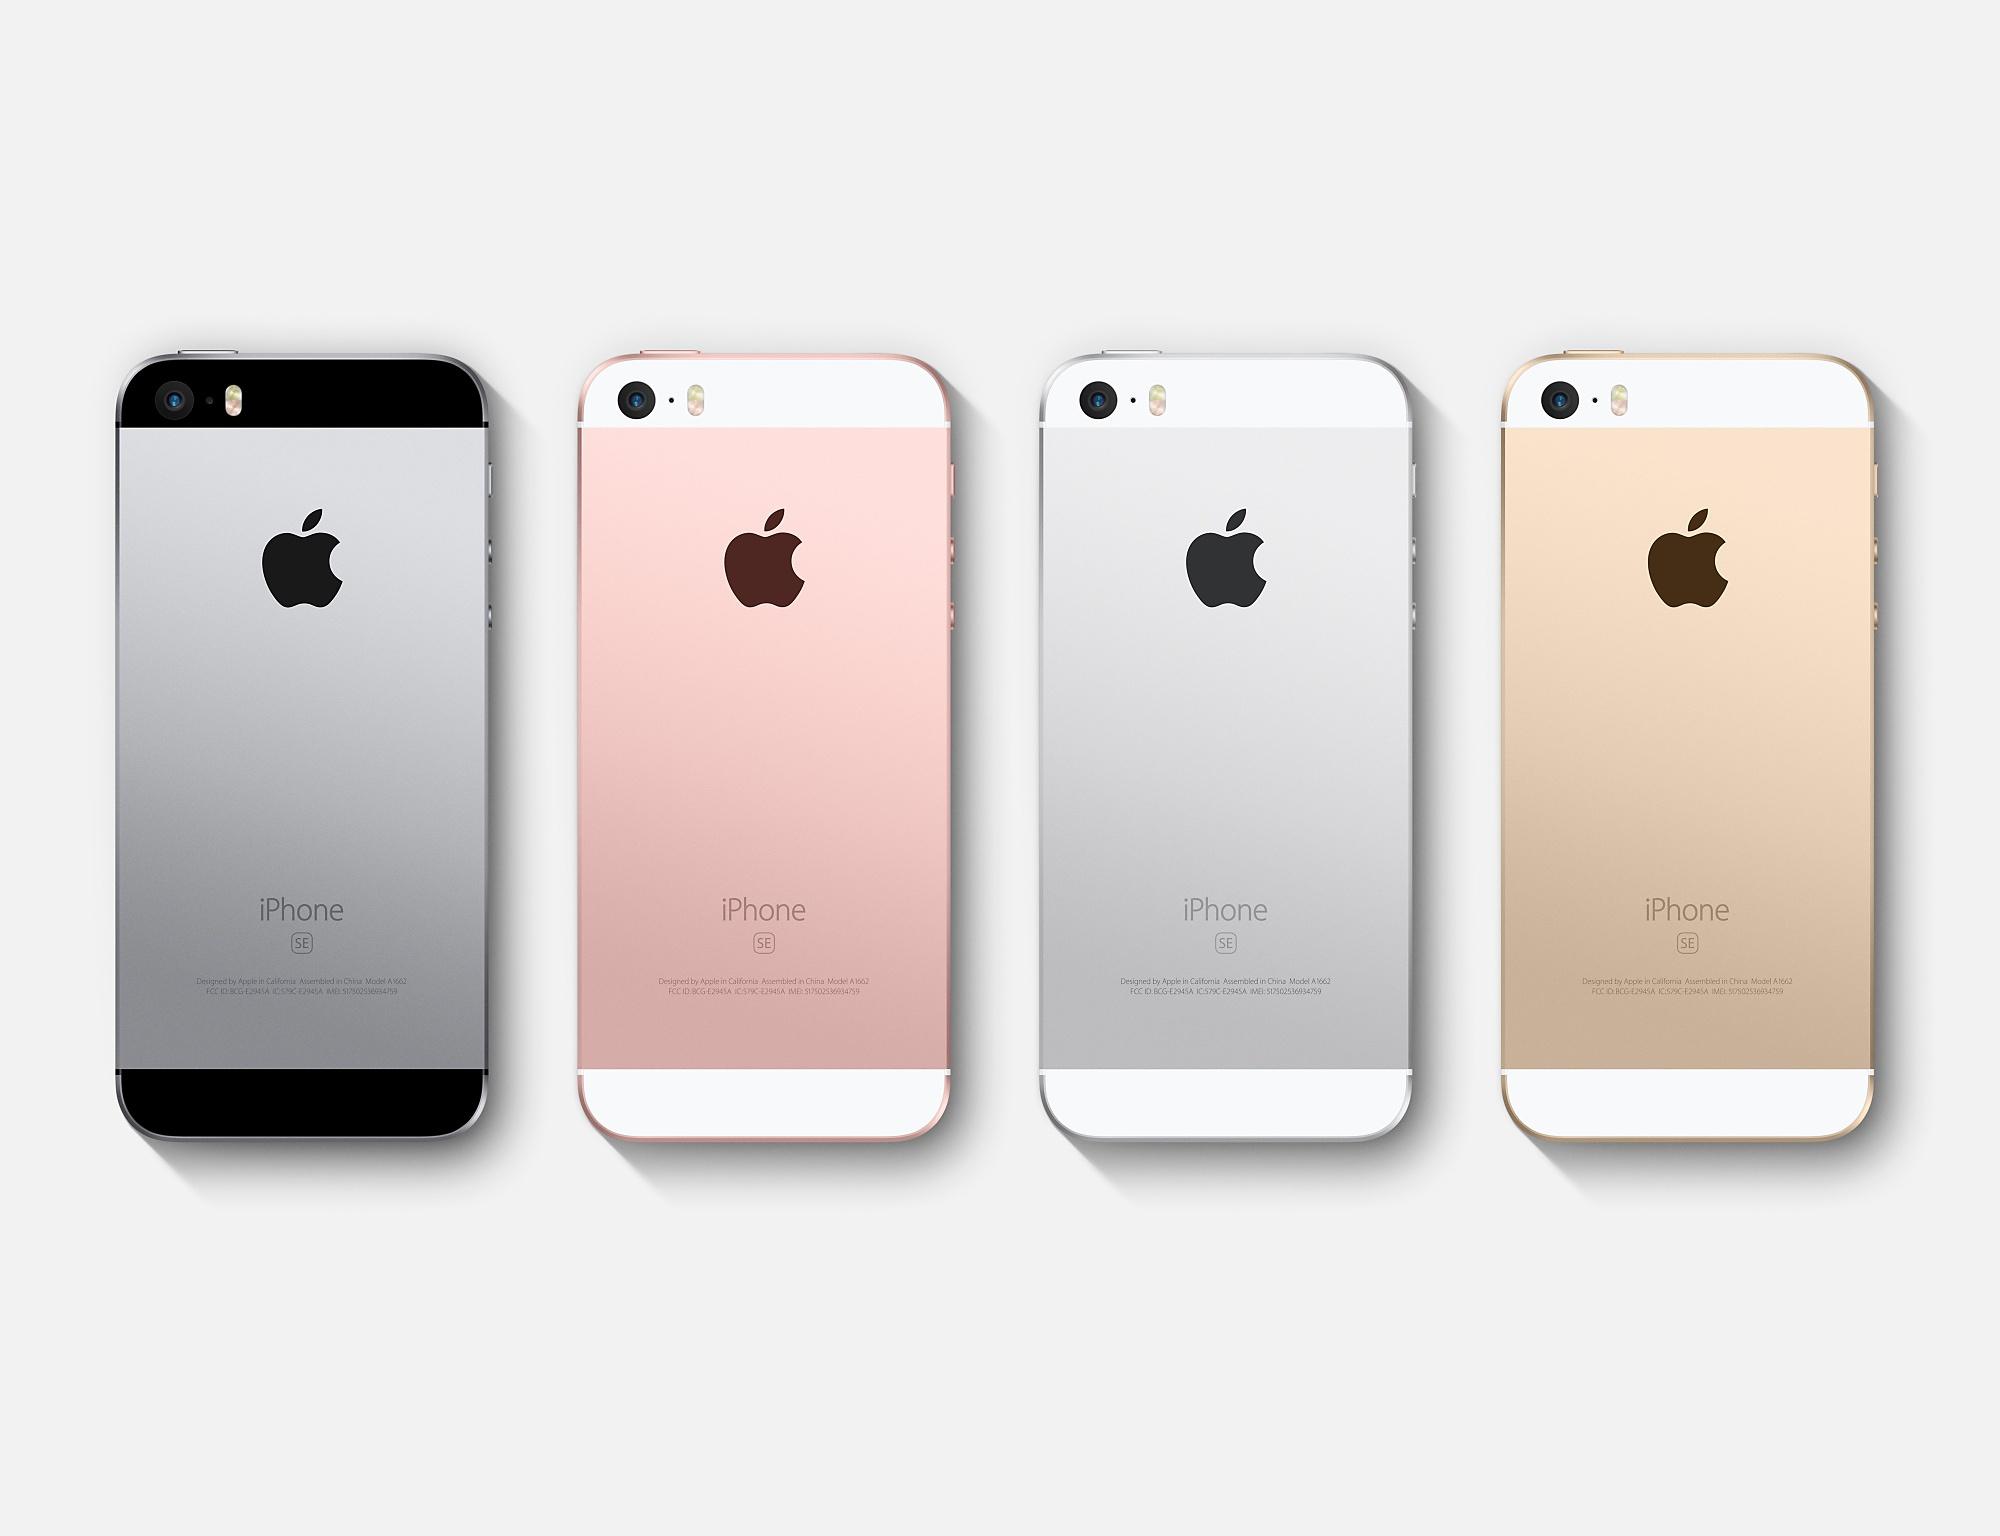 iPhone SE - 4-calowy telefon